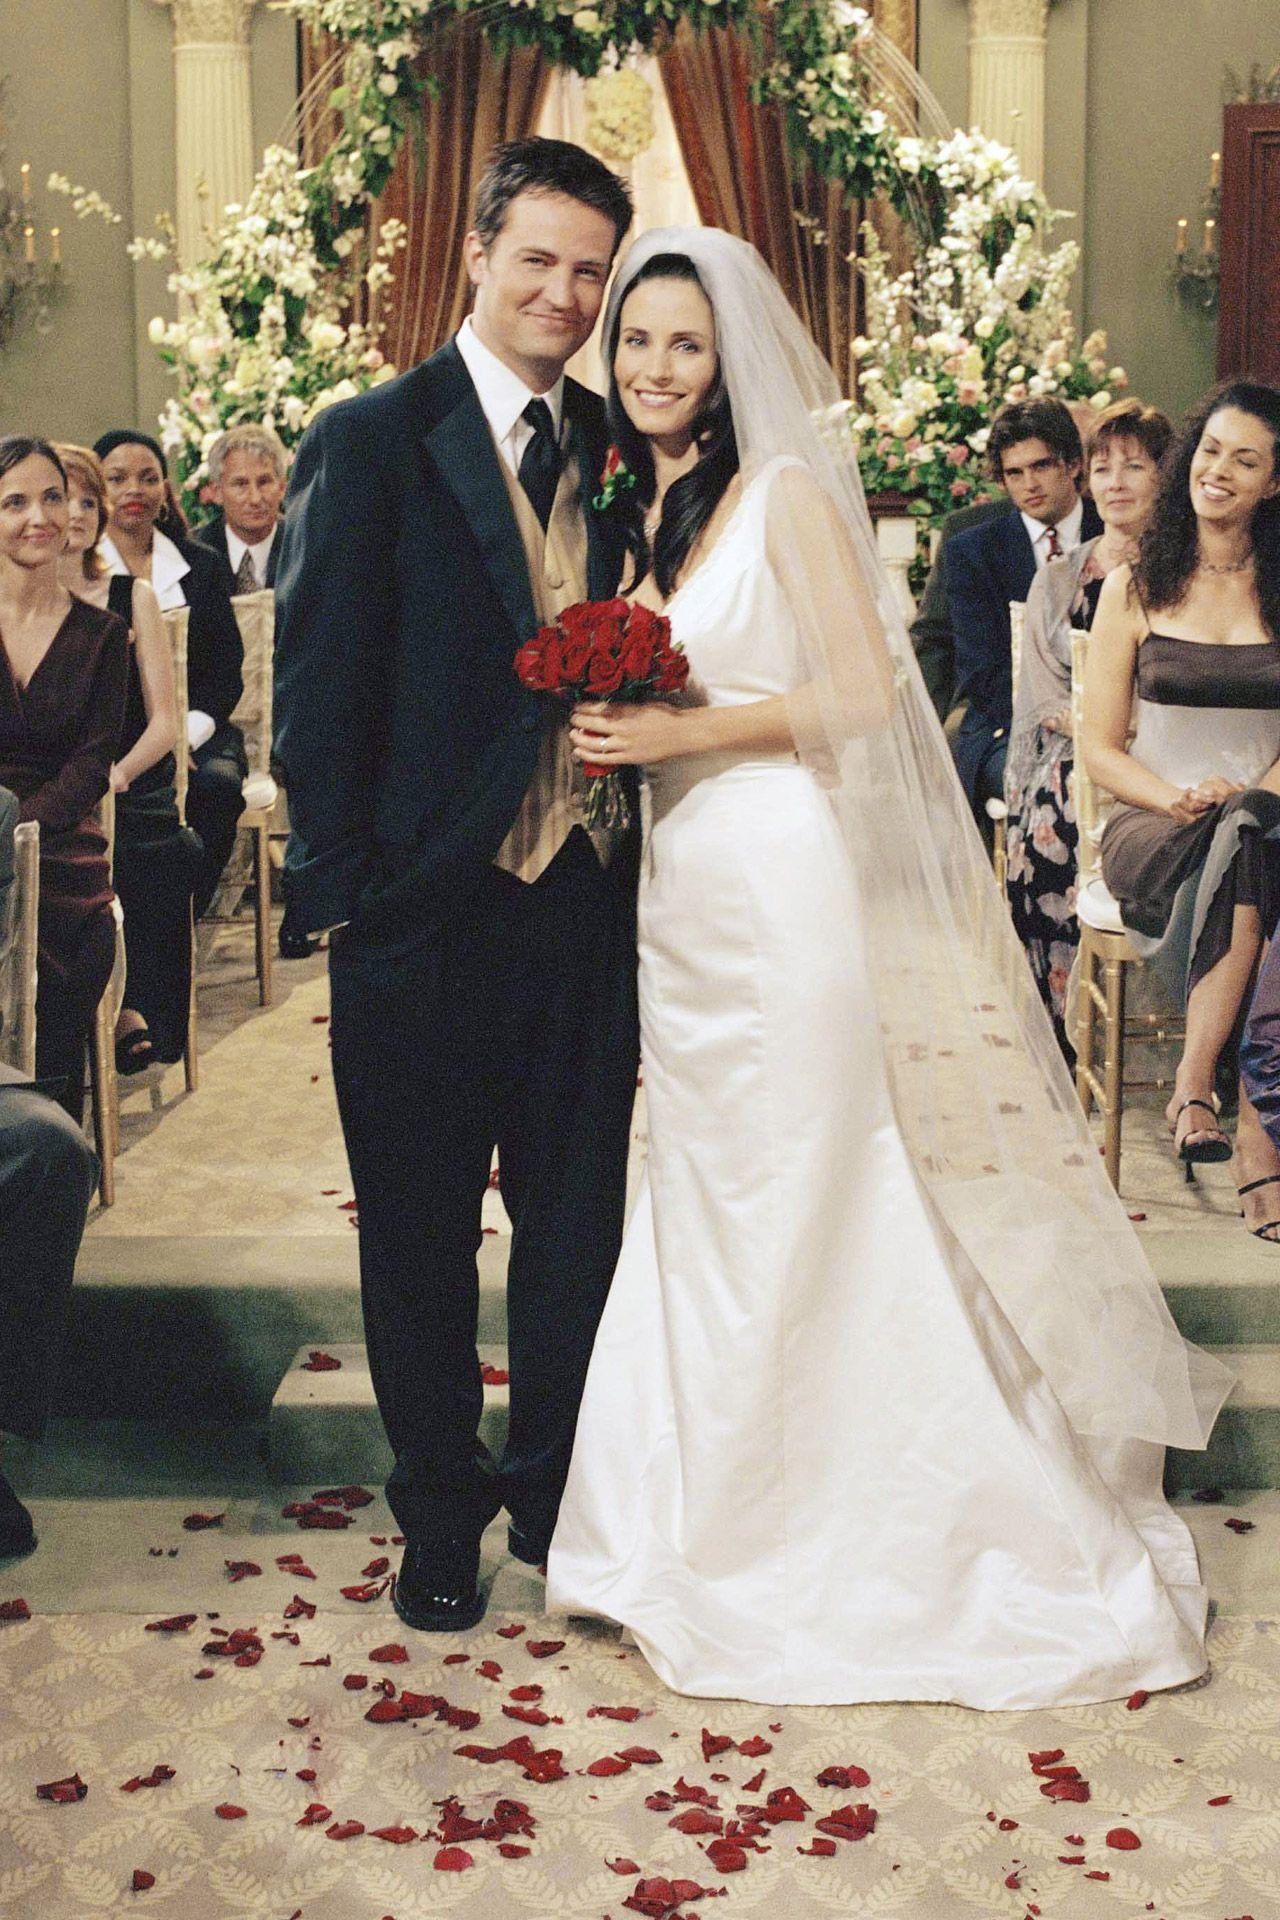 The Most Iconic Wedding Dresses Ever | Wedding icon, Wedding dress ...